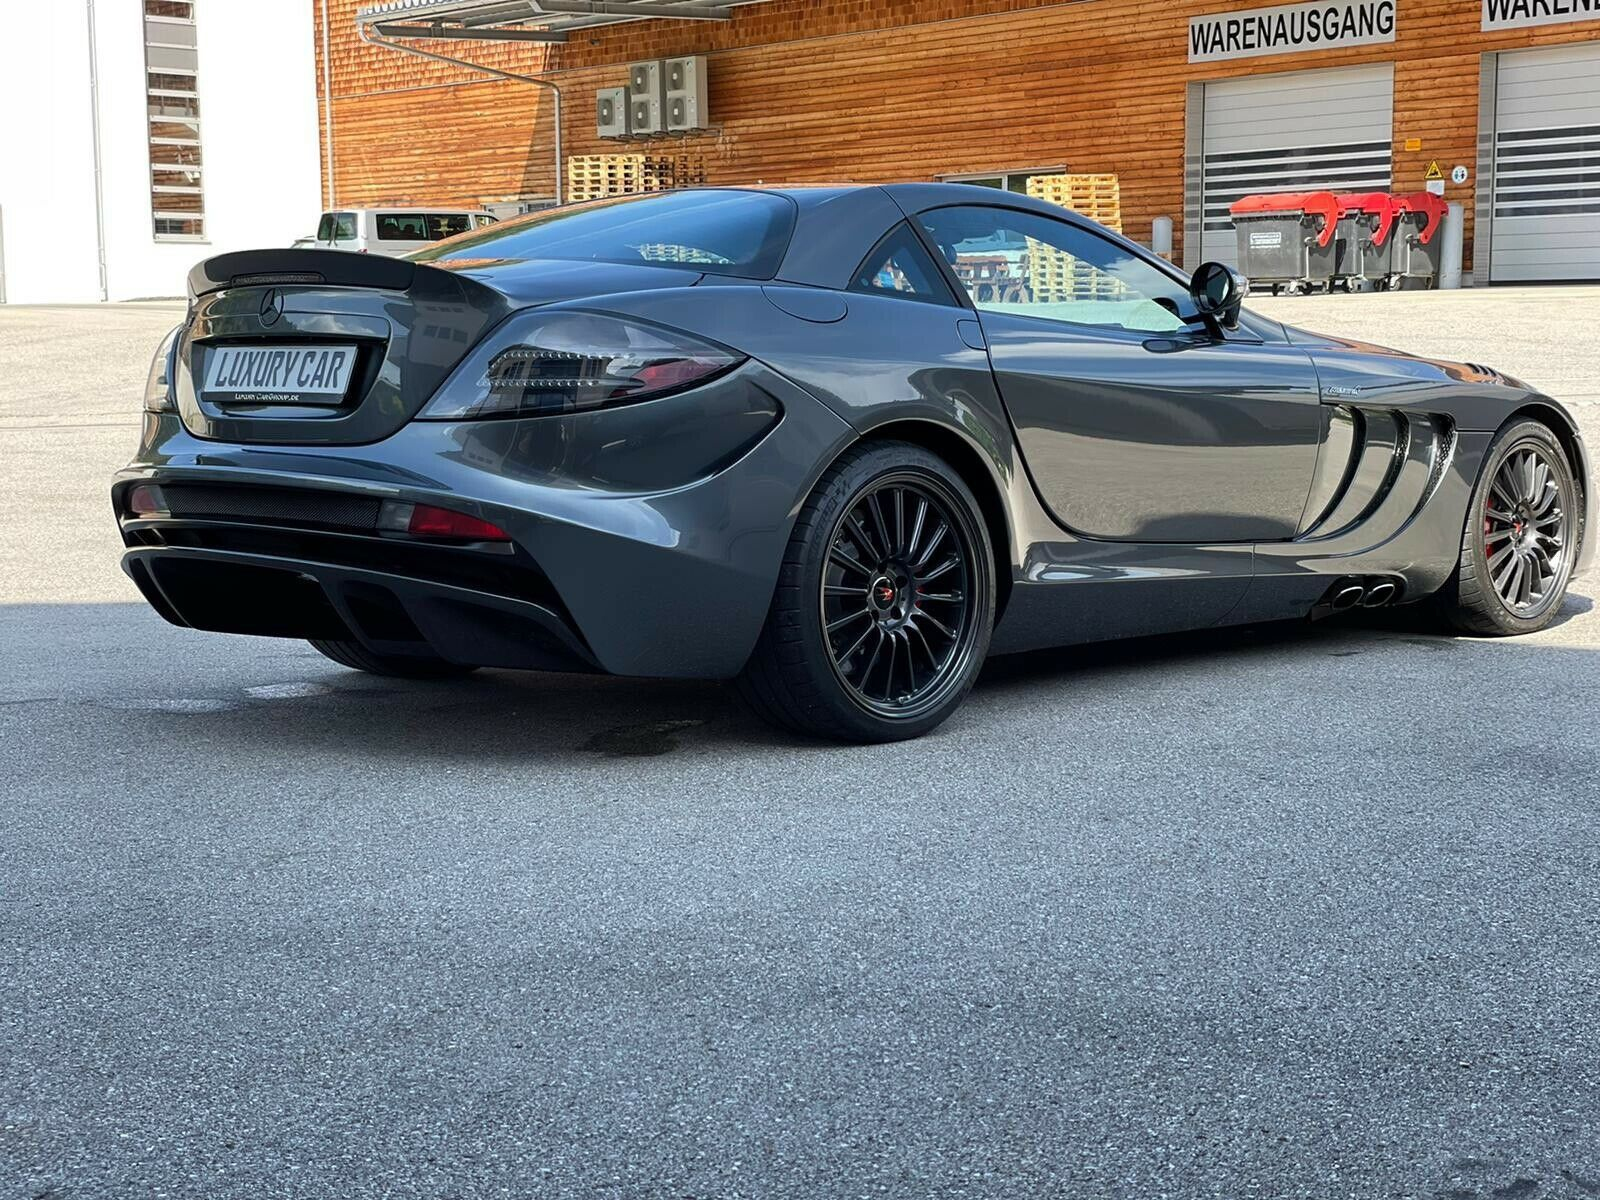 Mercedes-McLaren_SLR_722S_McLaren-Edition_sale-0007